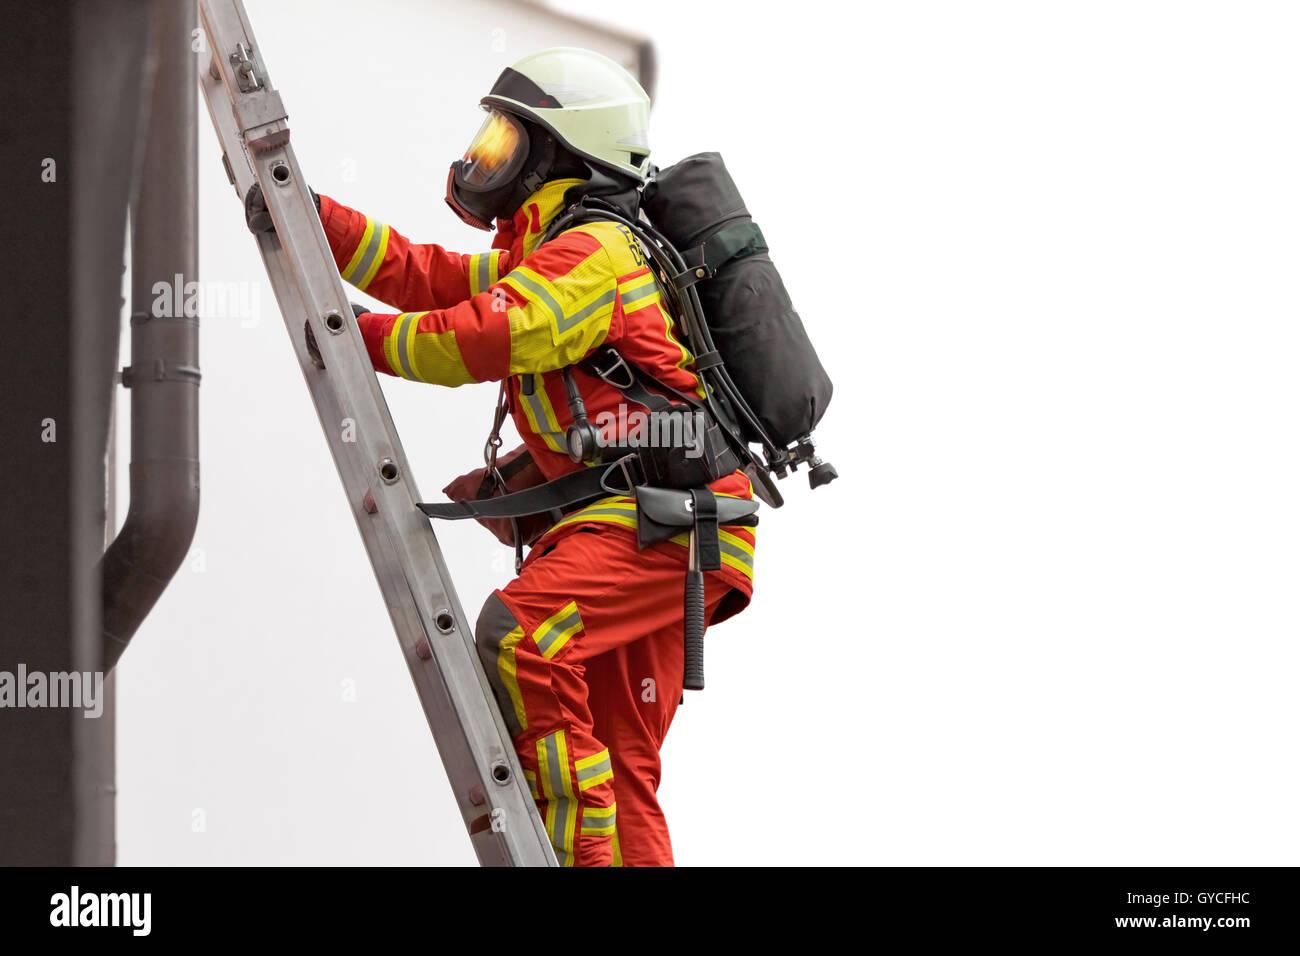 Fireman climbing a ladder set on a building - Stock Image